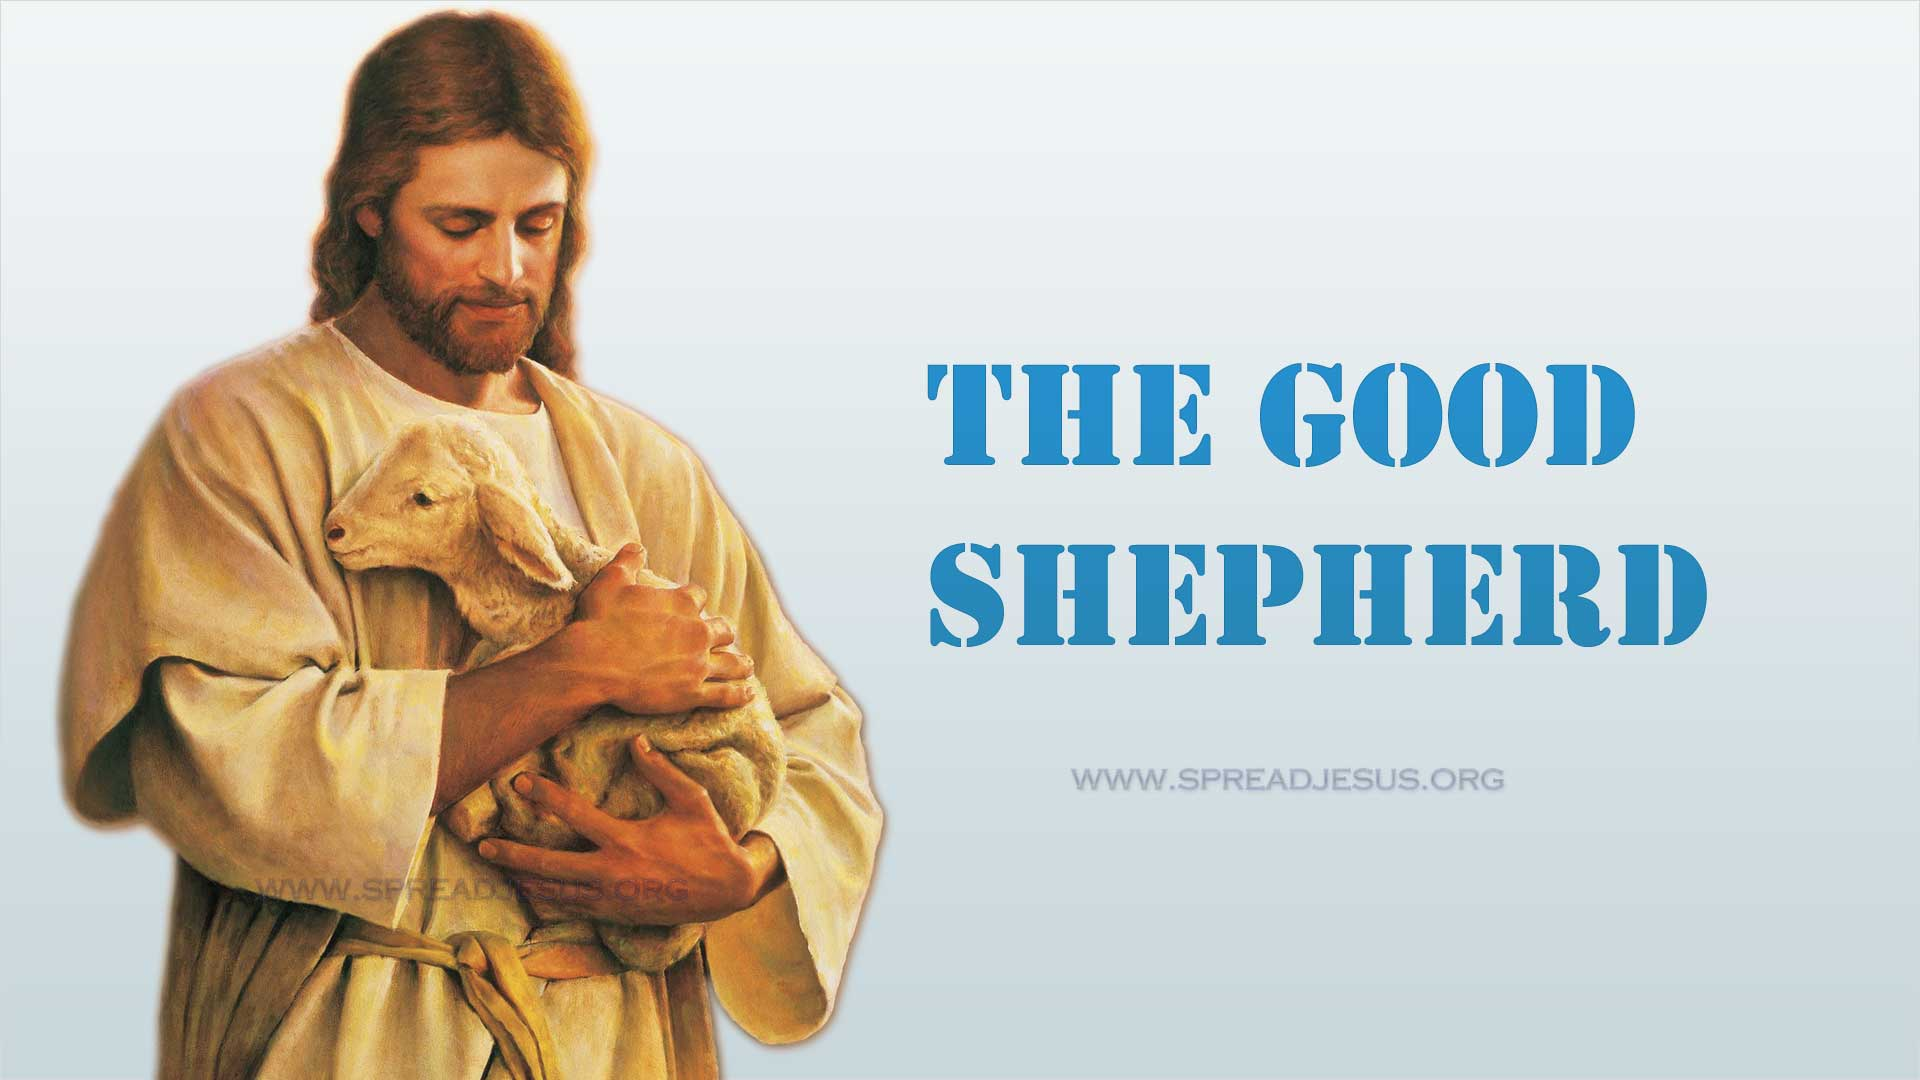 The Good Shepherd1:HD wallpapers